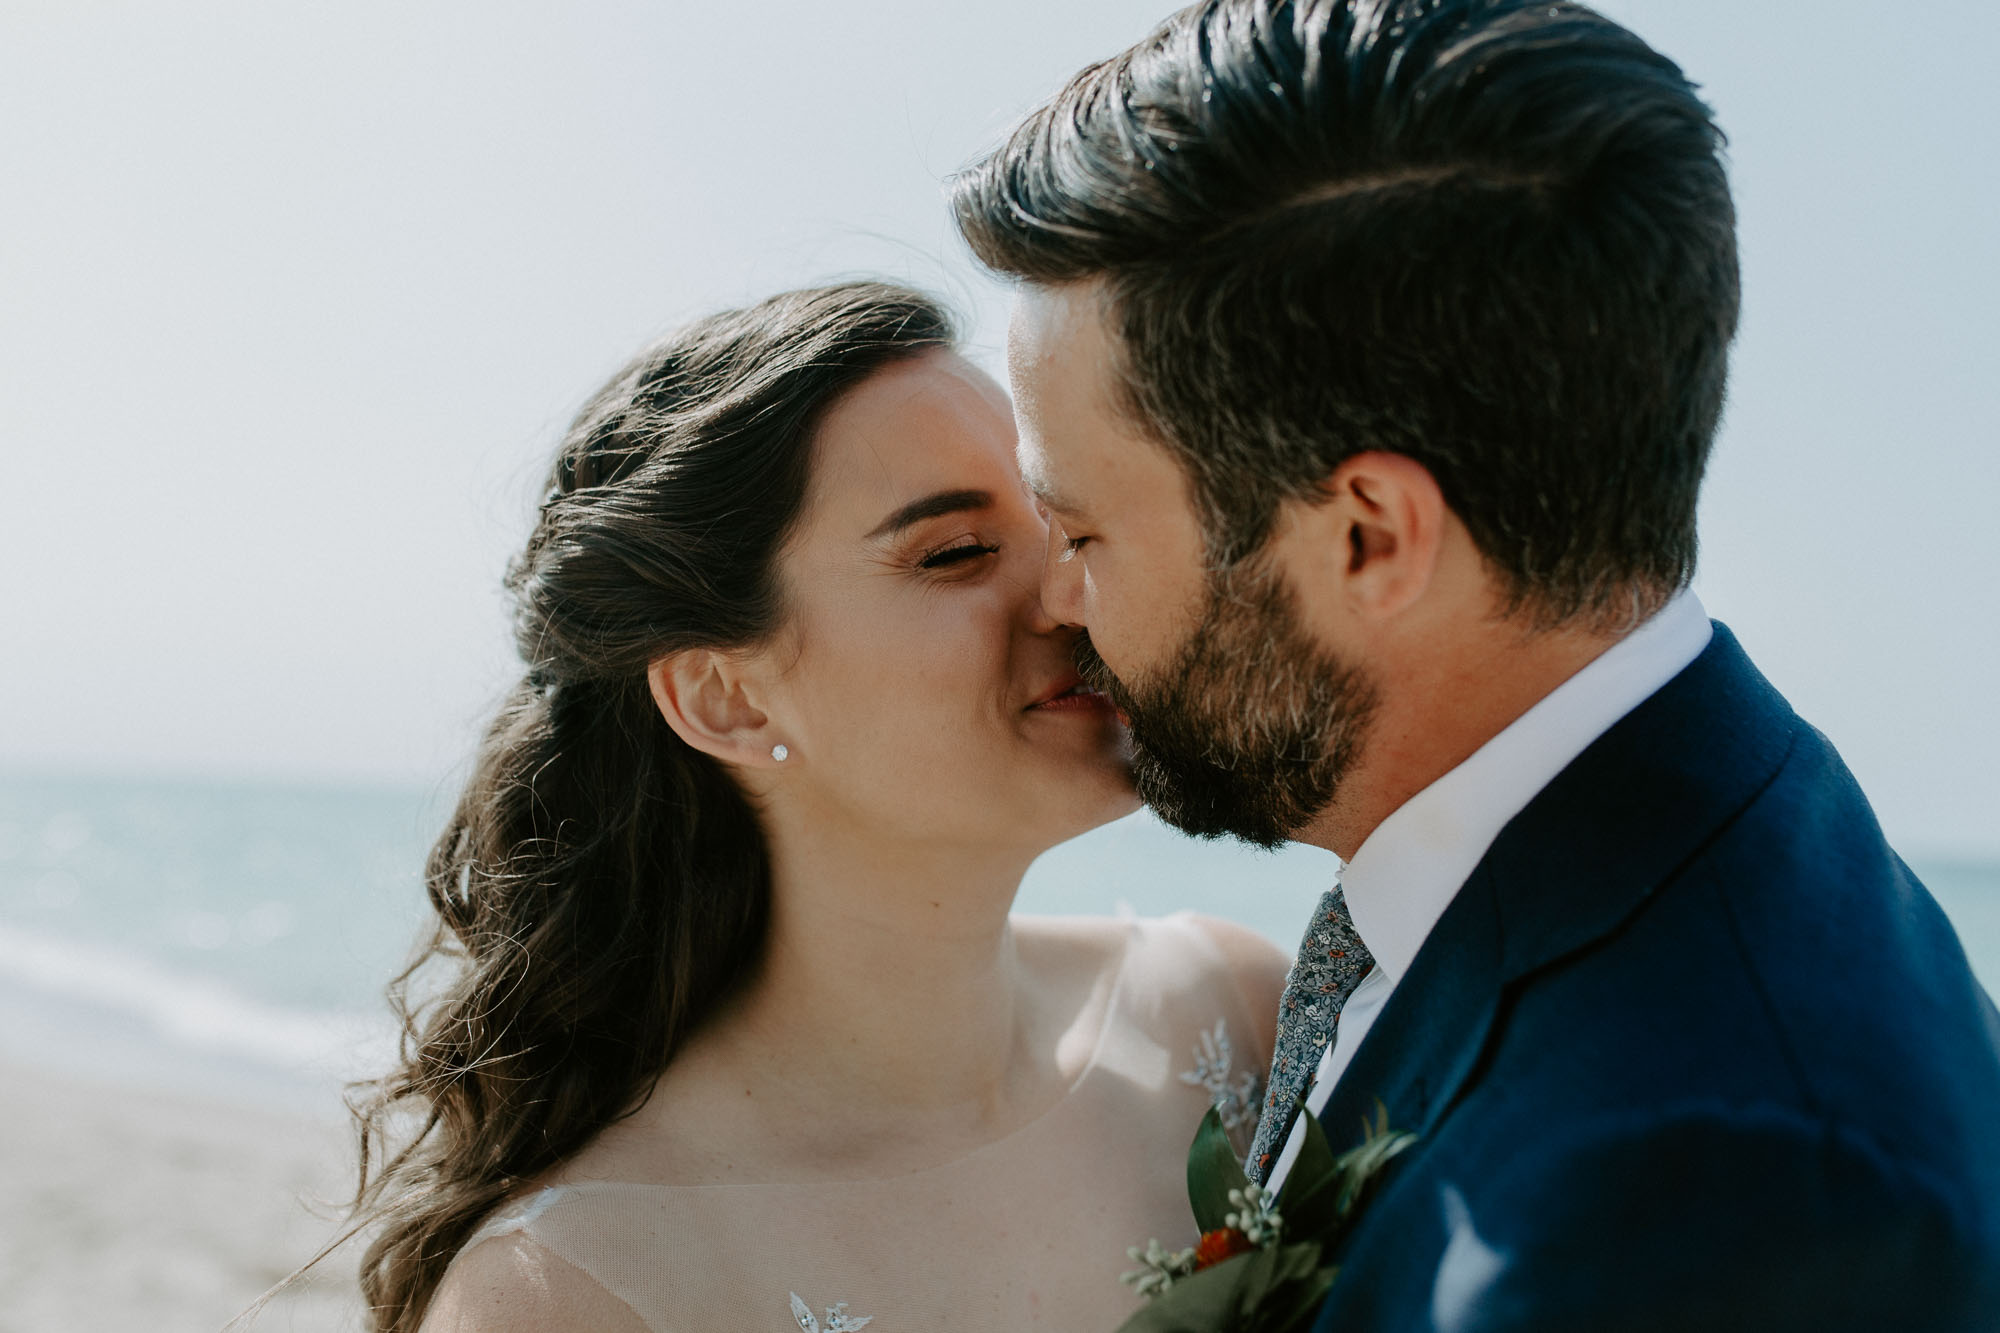 journeyman_distillery_wedding_photographer_chicago_il_wright_photographs-2802.jpg